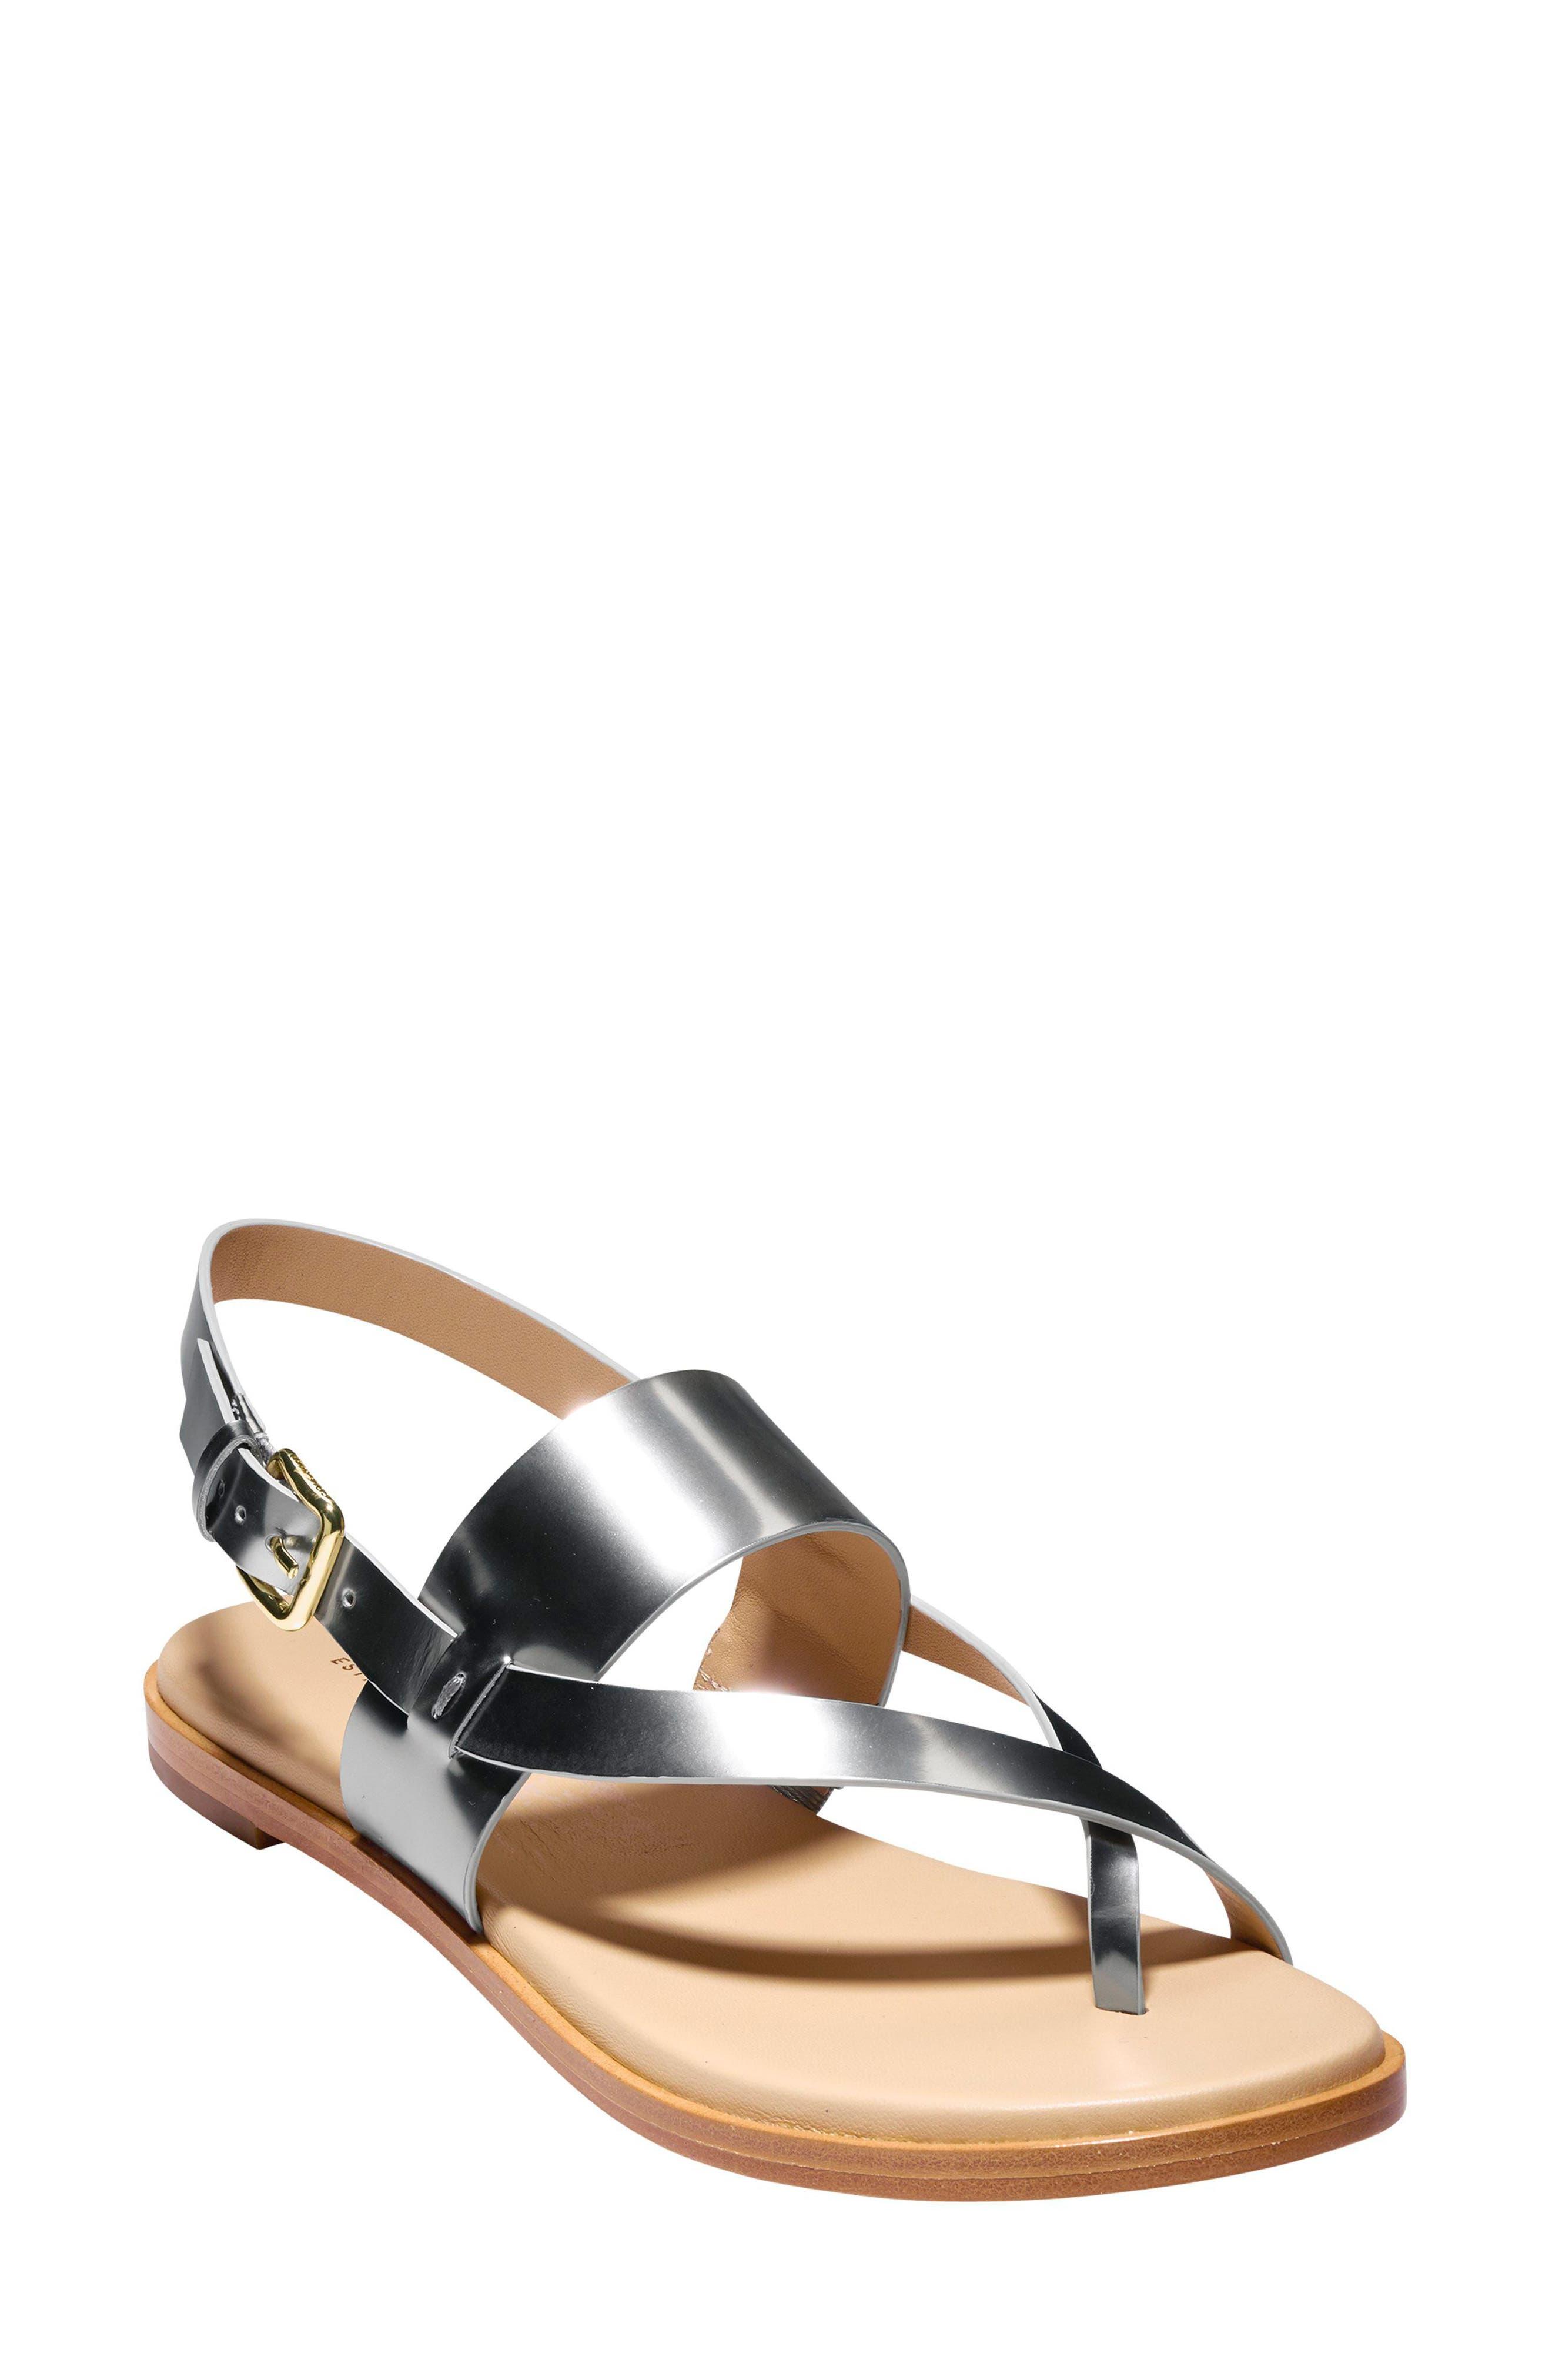 Anica Sandal,                         Main,                         color,